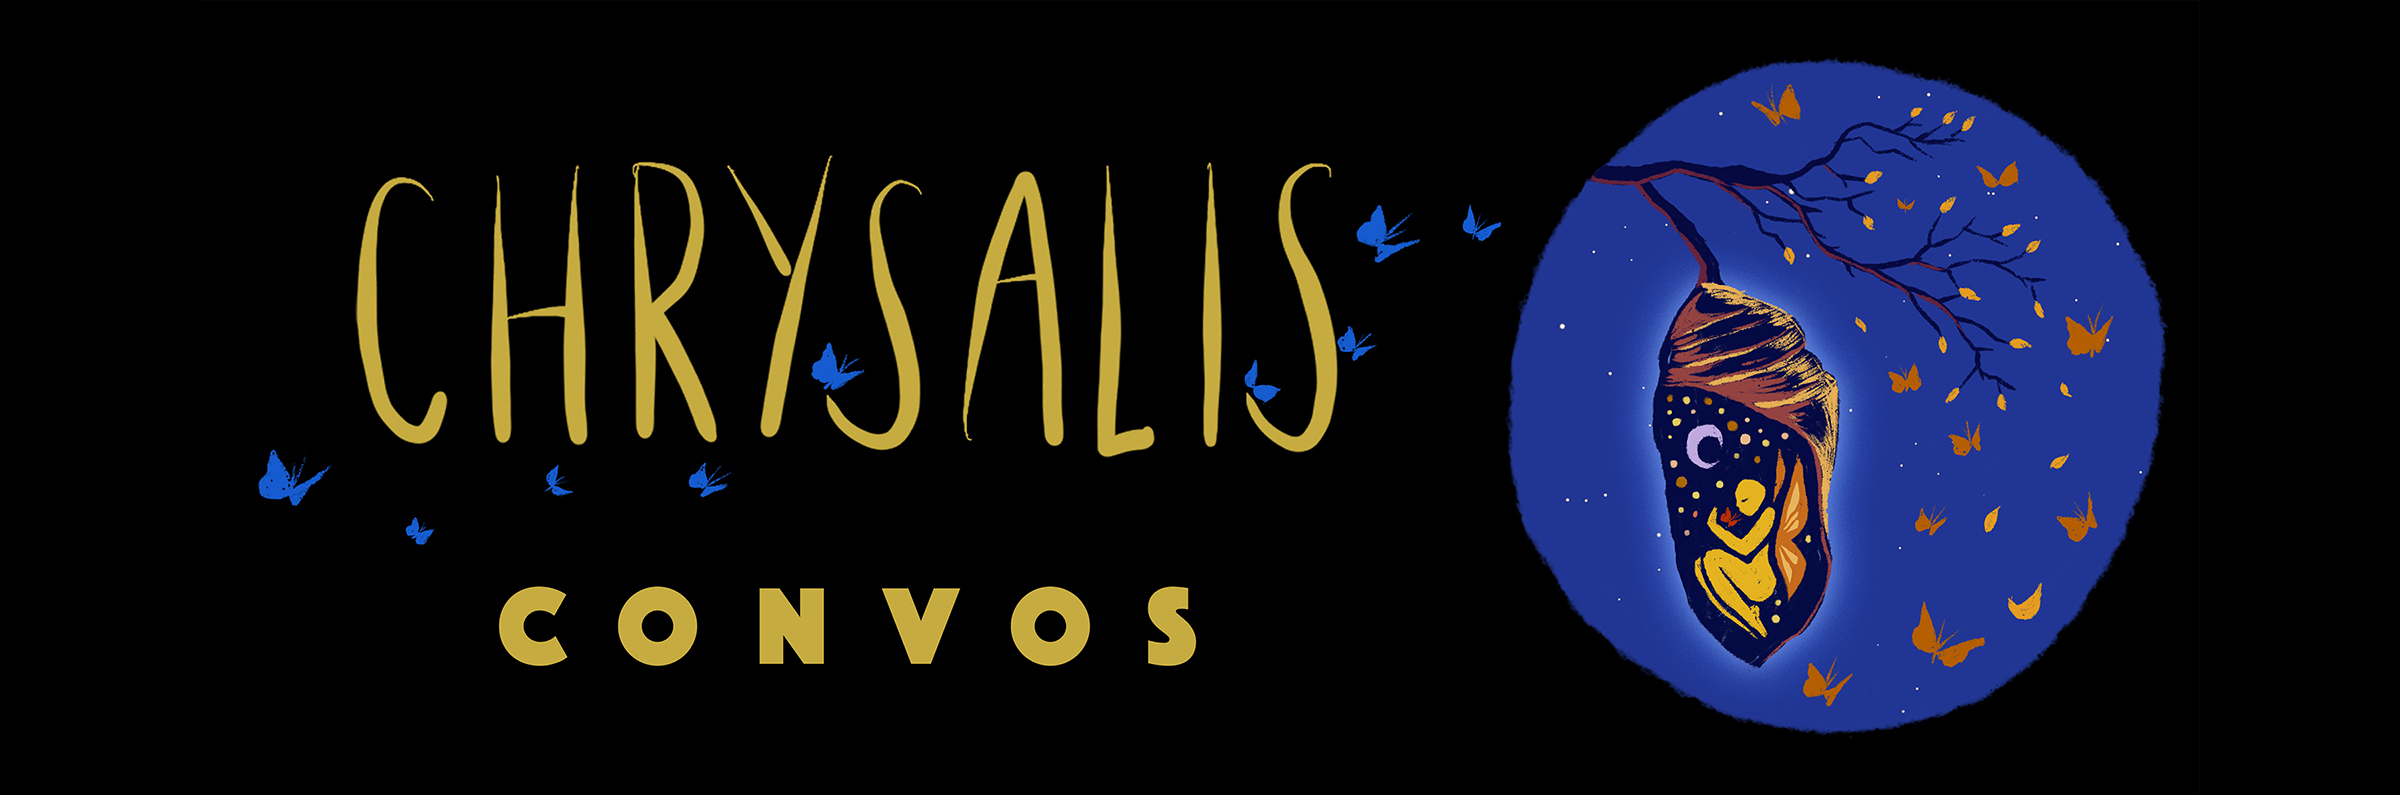 ChrysalisConvos_banner.jpg